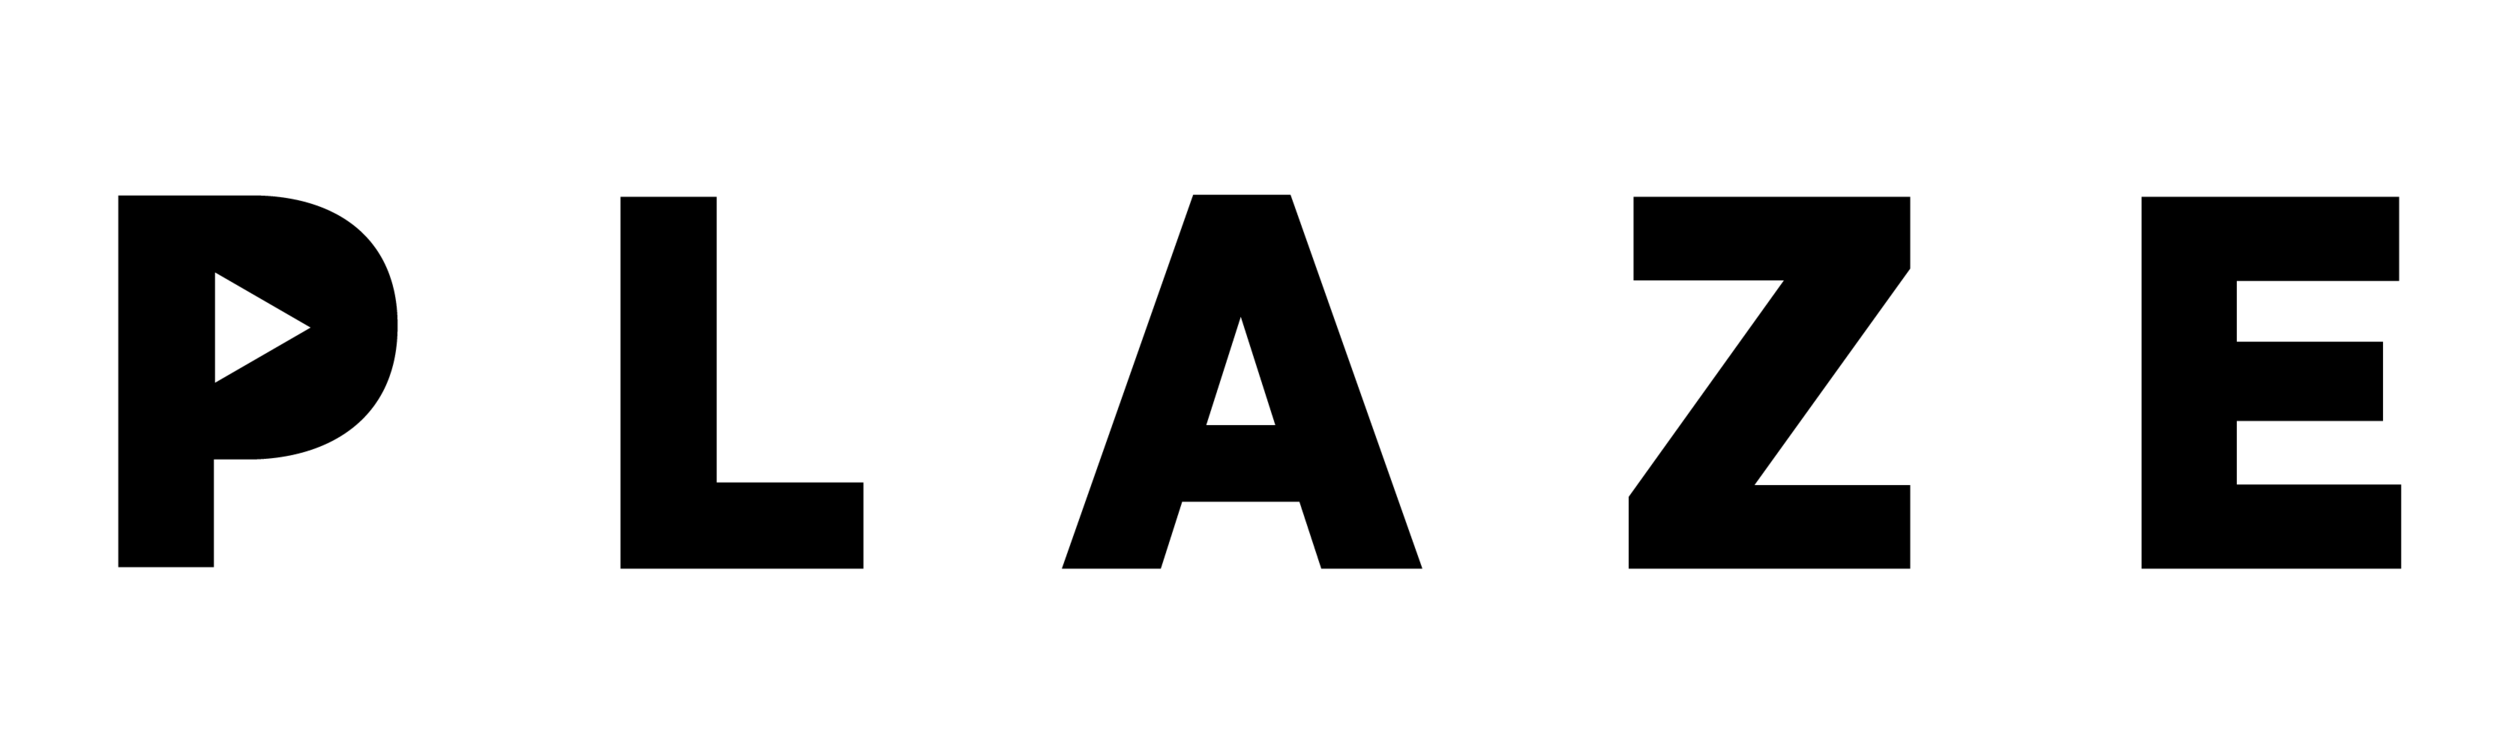 Plaze_logo.png